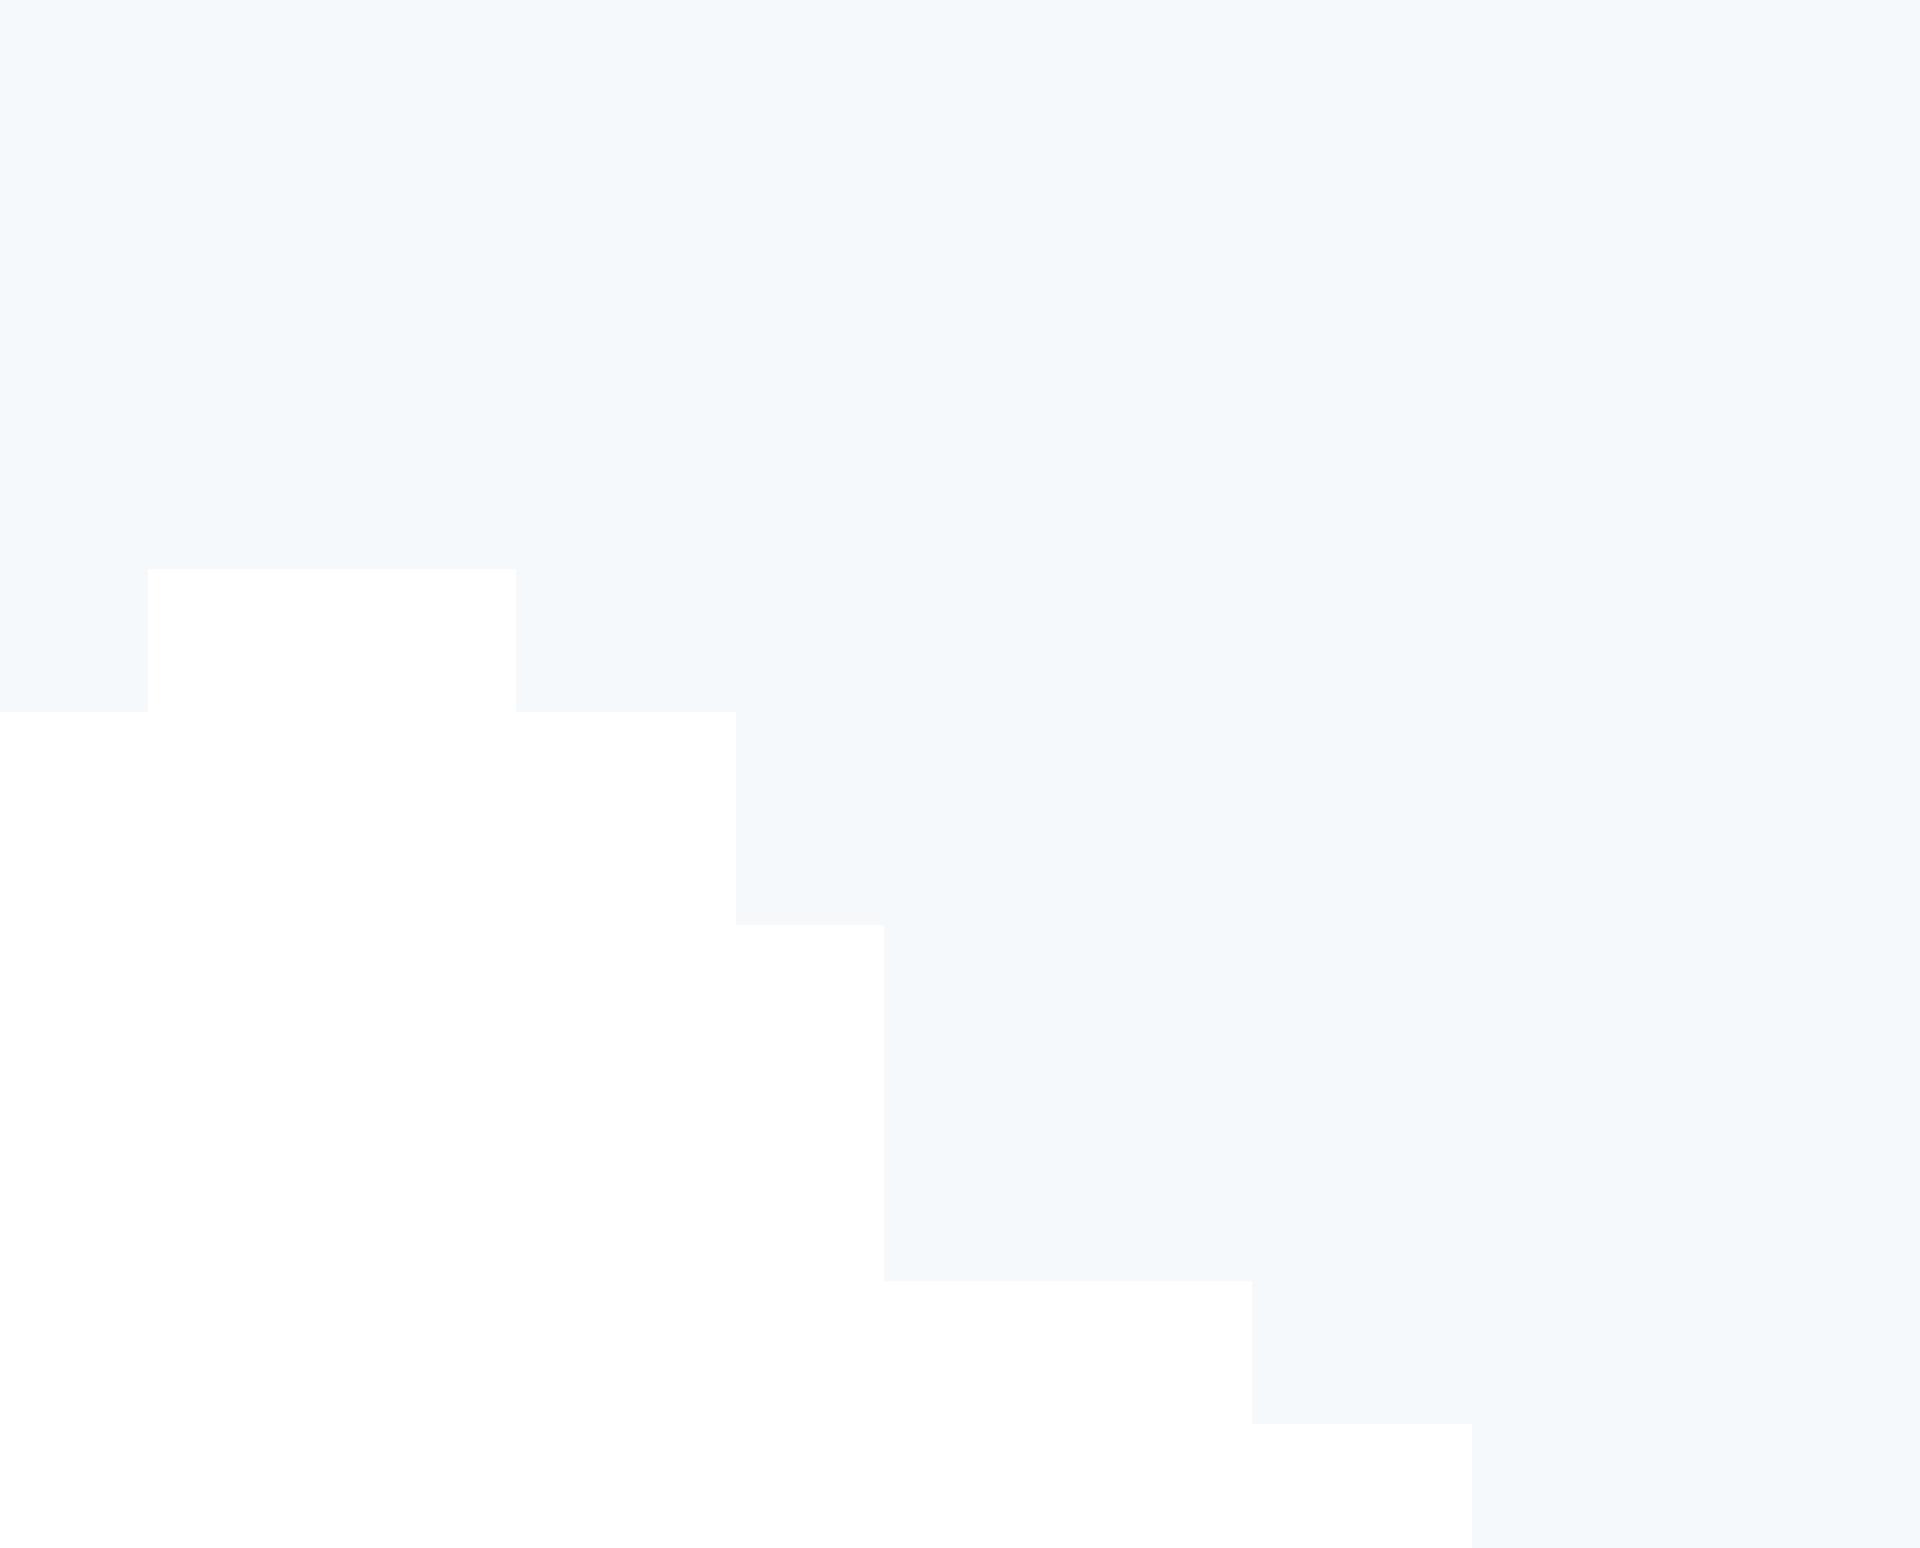 shape img